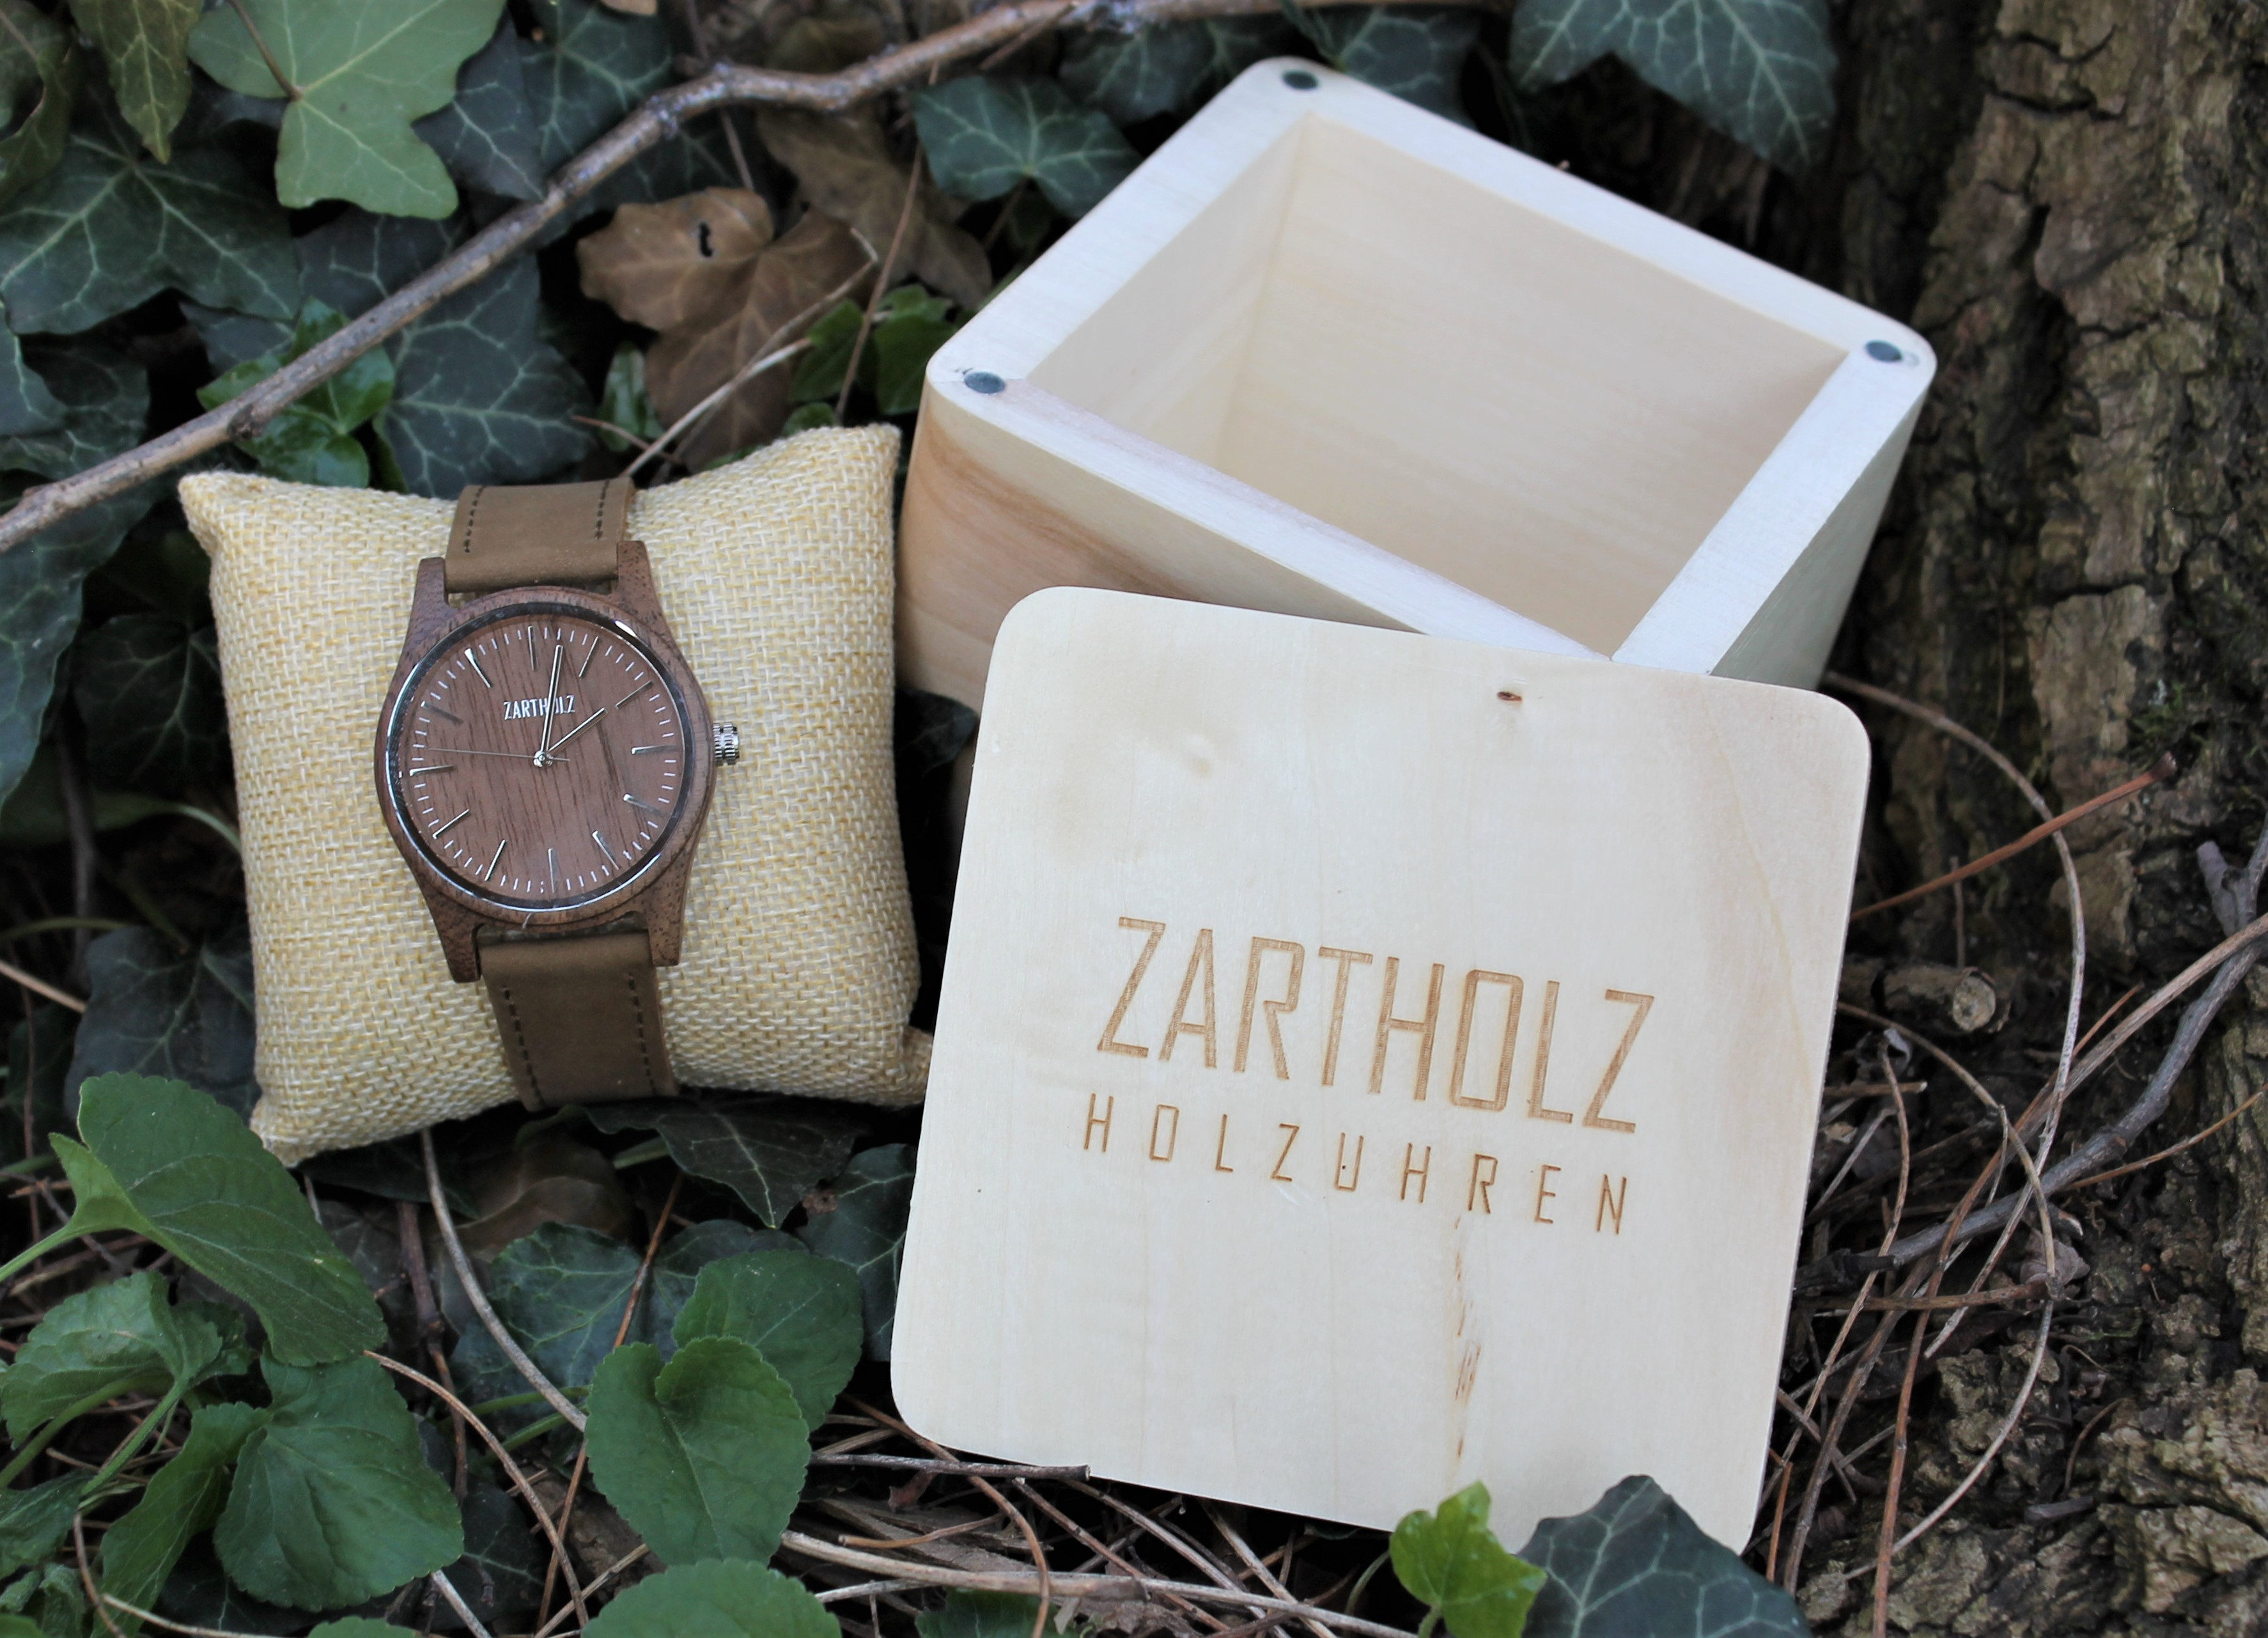 Zartholz Meister